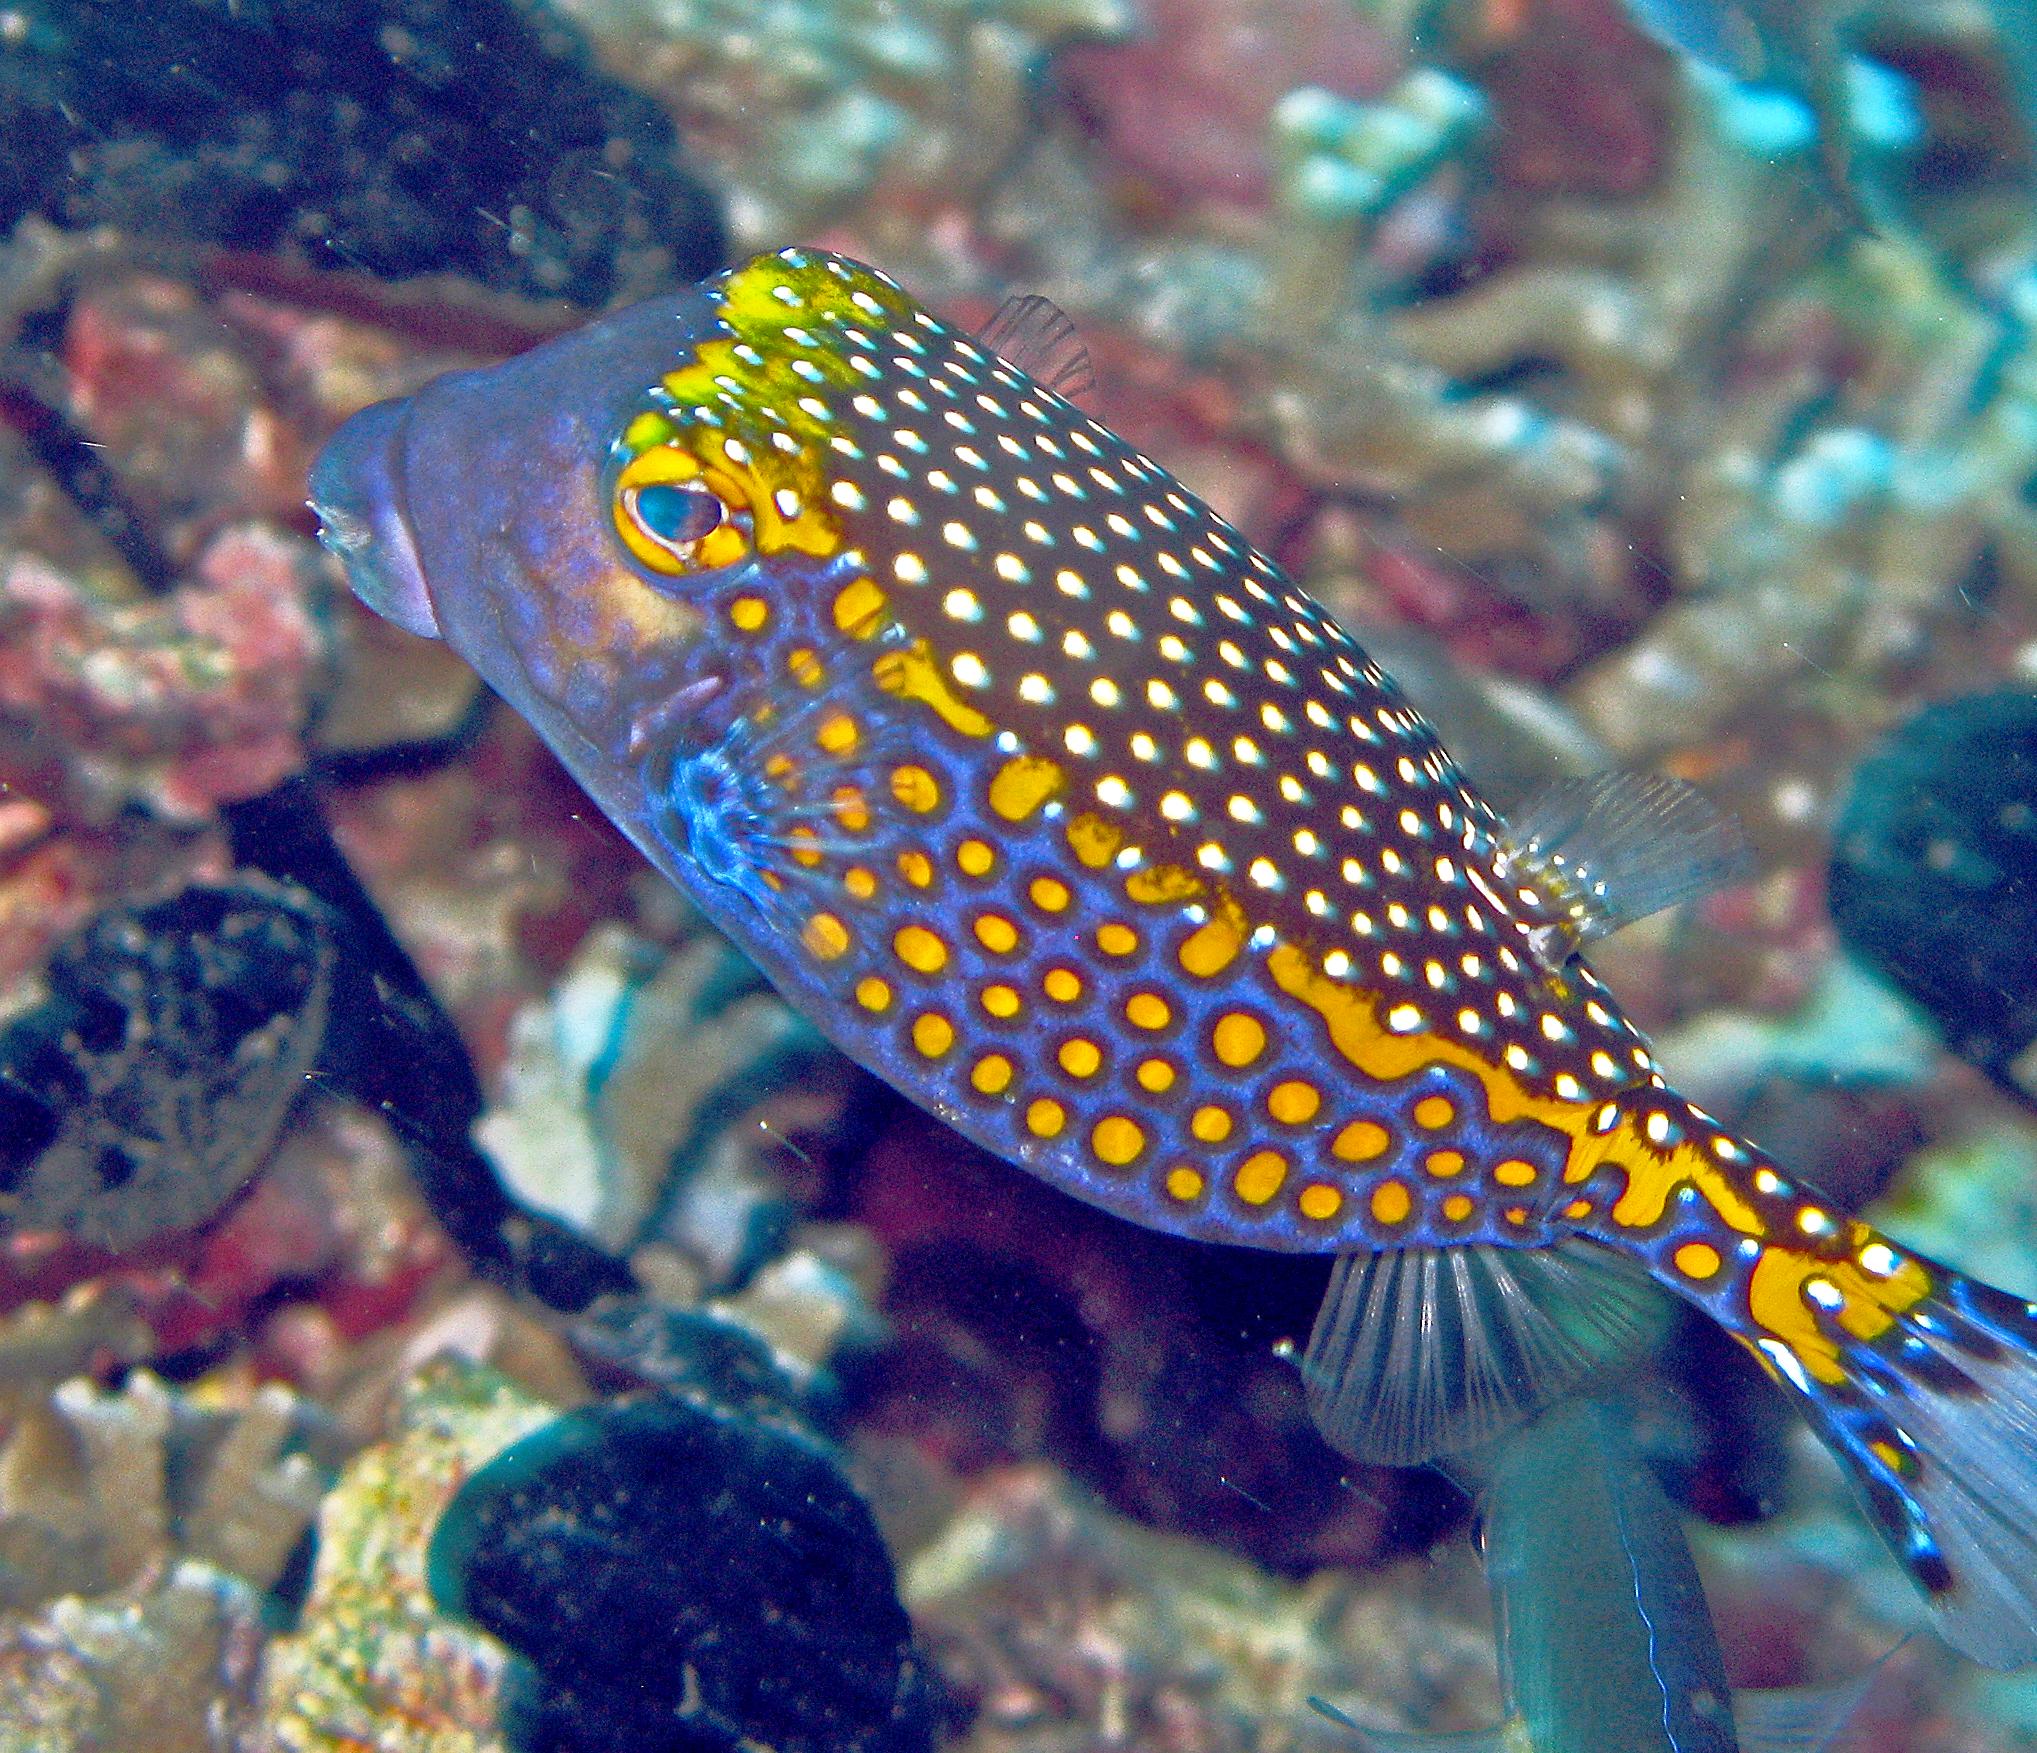 File:Whitespotted boxfish - Ostracion meleagris.jpg - Wikimedia ...